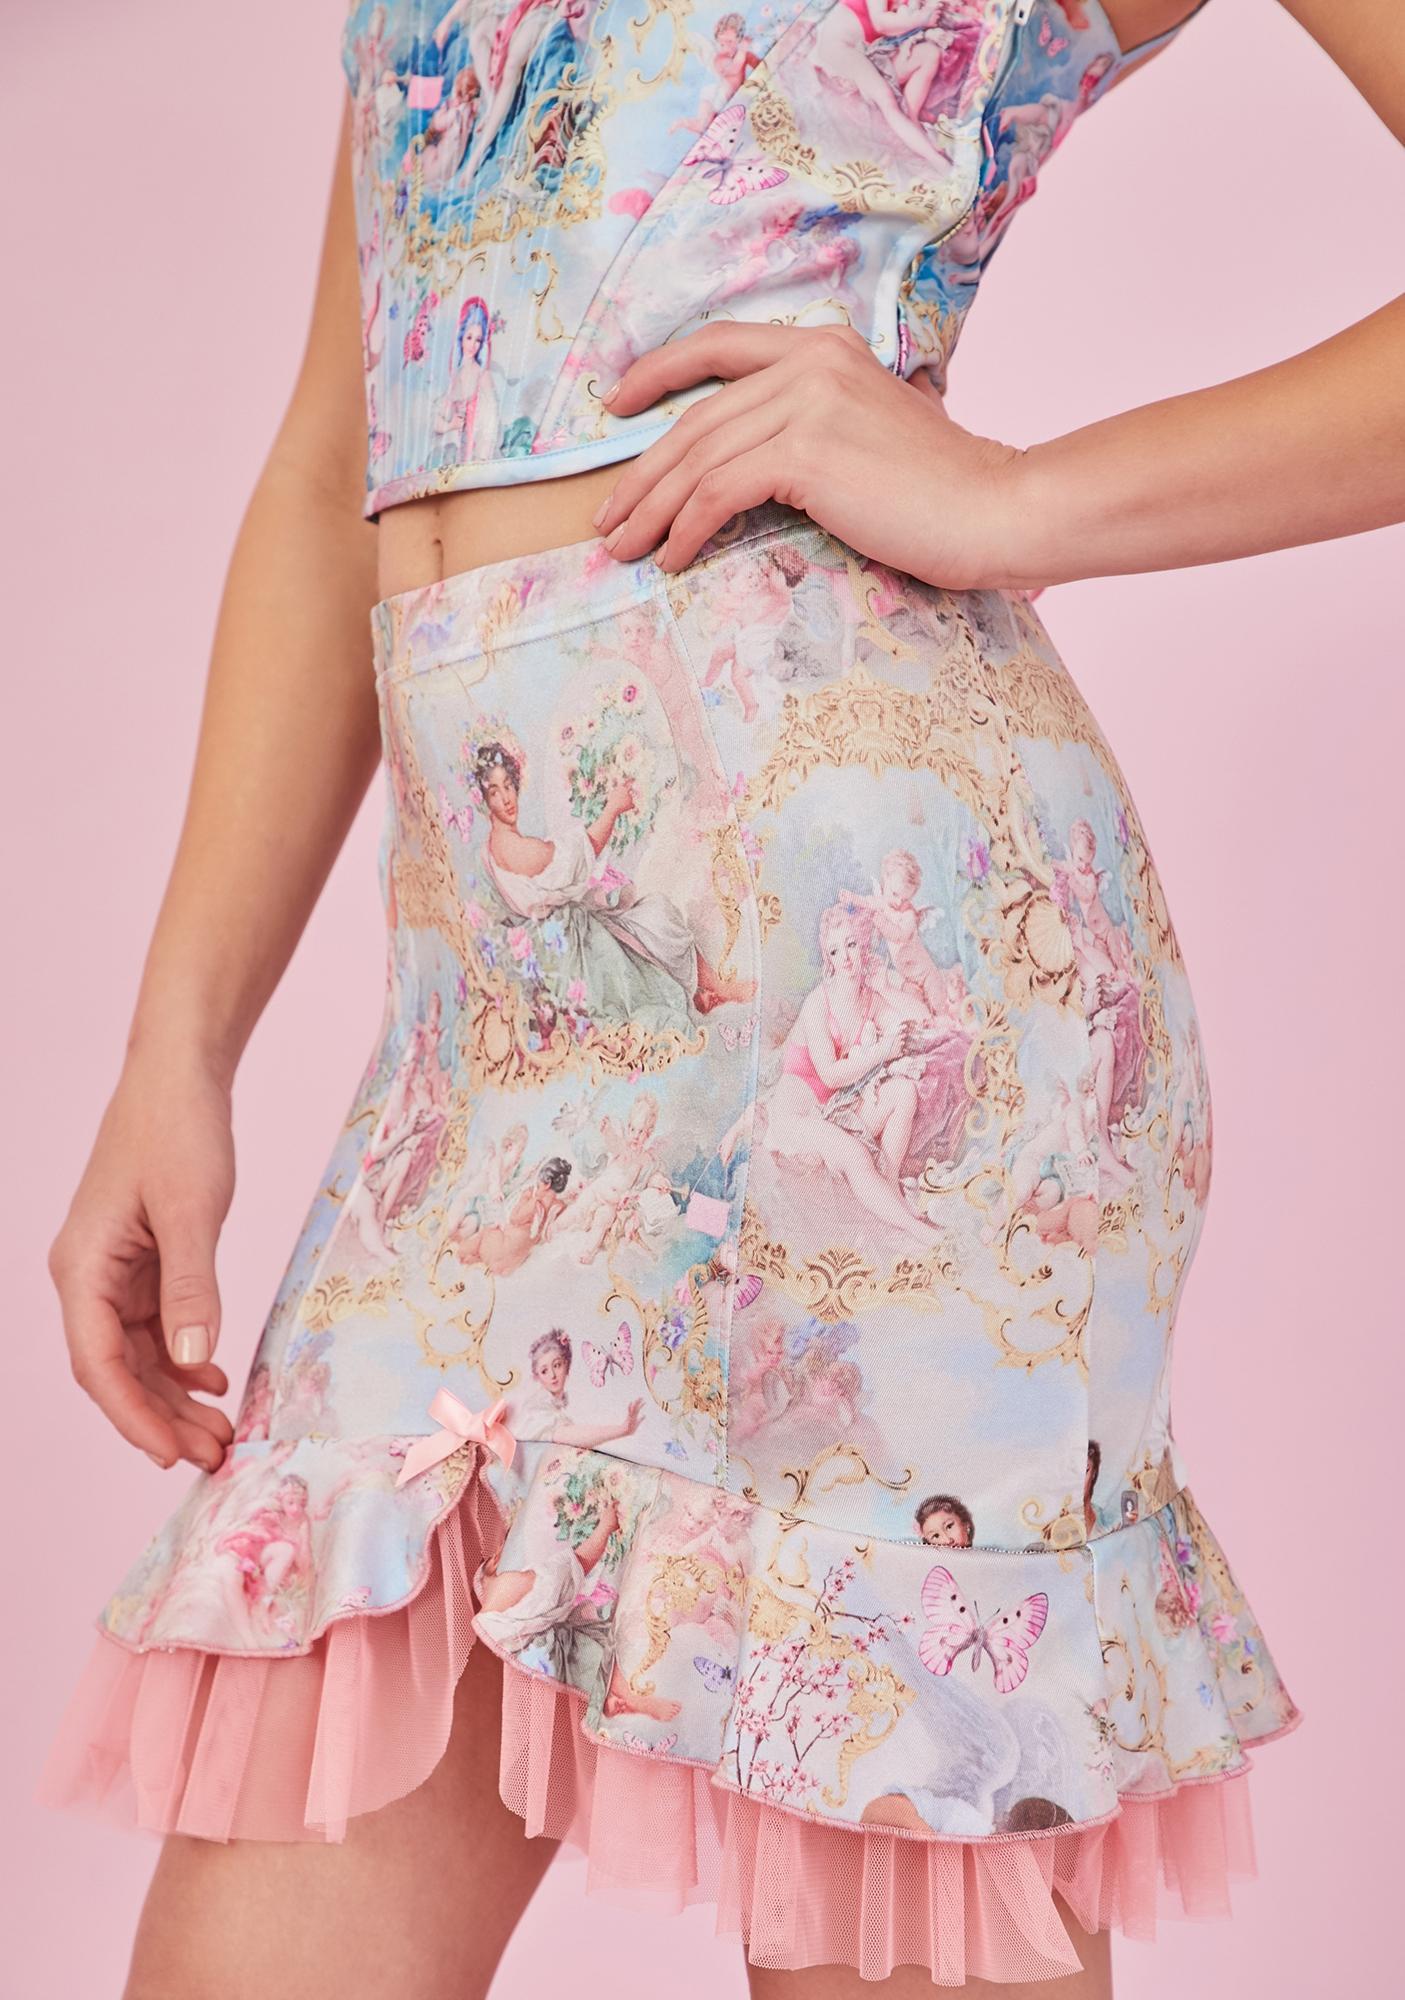 Sugar Thrillz Divine Lush Opulence Satin Skirt